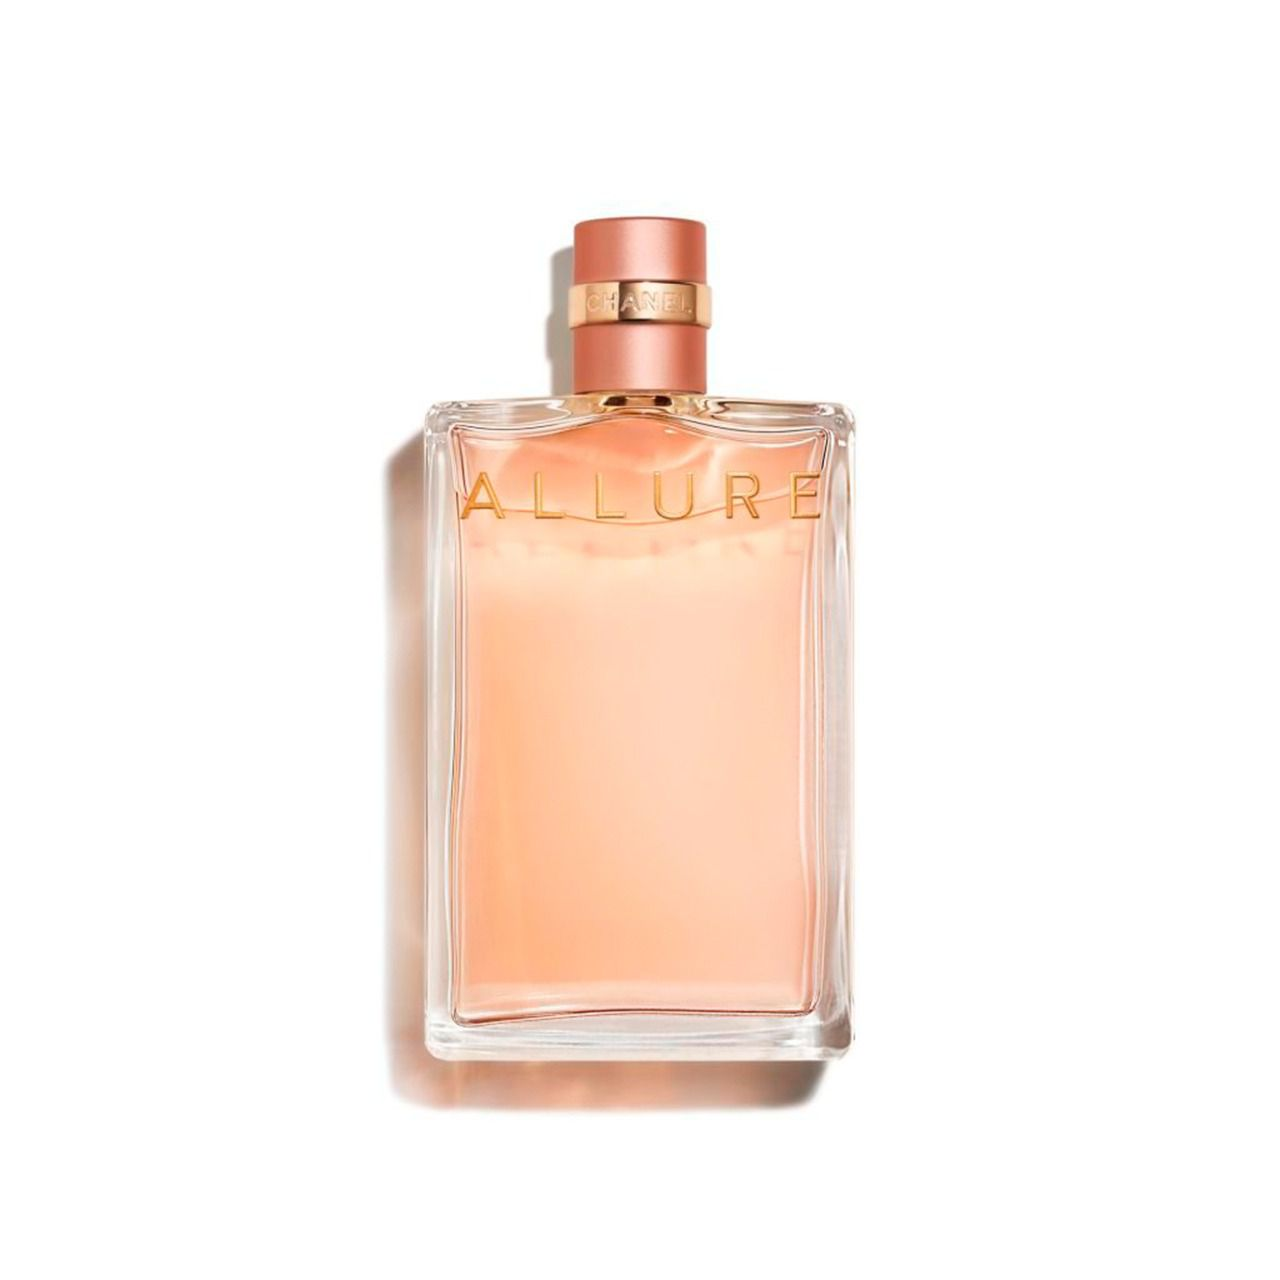 Allure Chanel Eau de Parfum Perfume Feminino